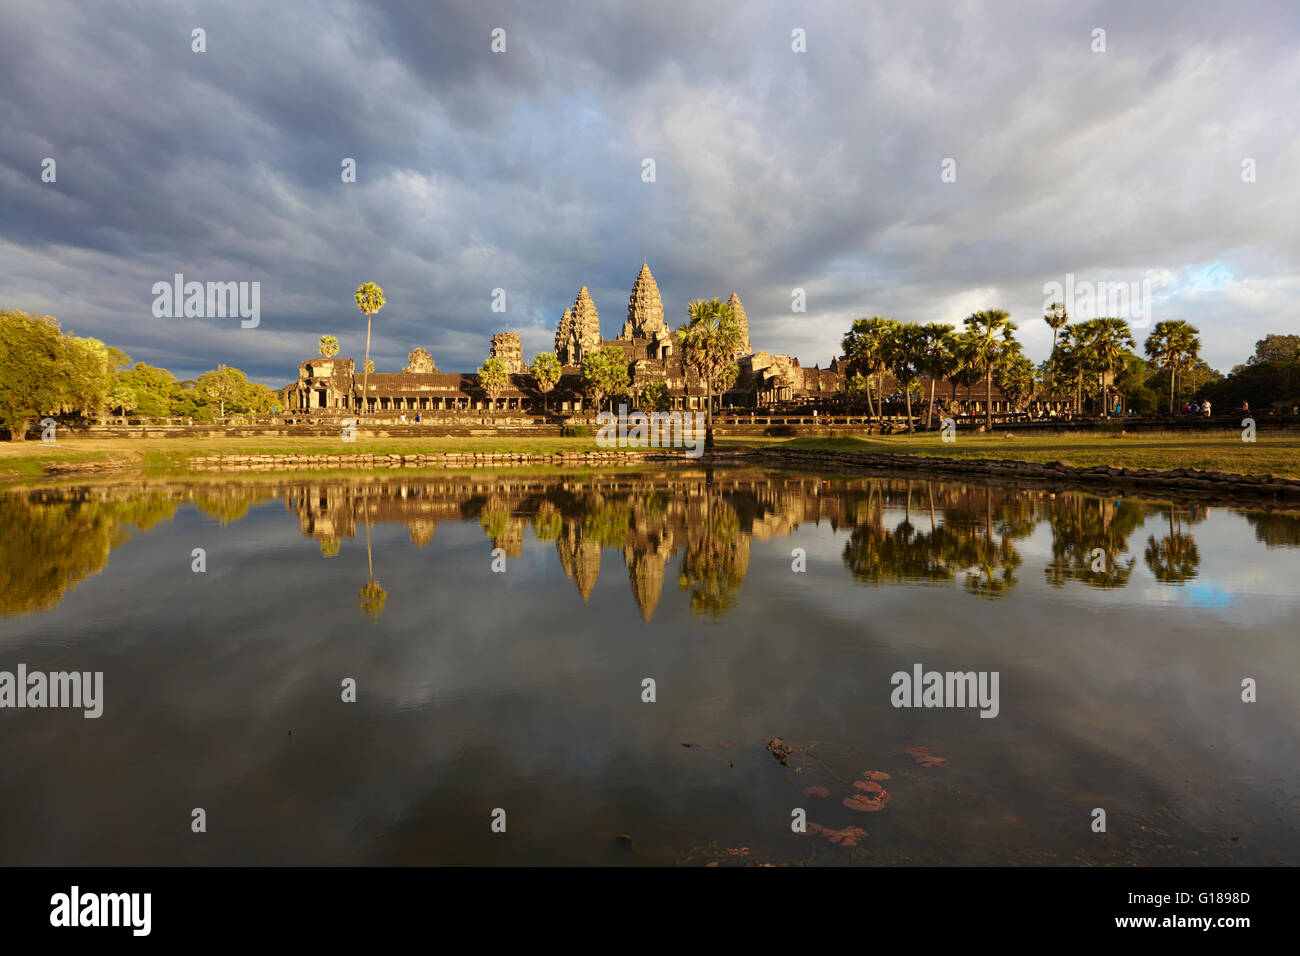 Angkor Wat temple, Siem Reap, Cambodia - Stock Image